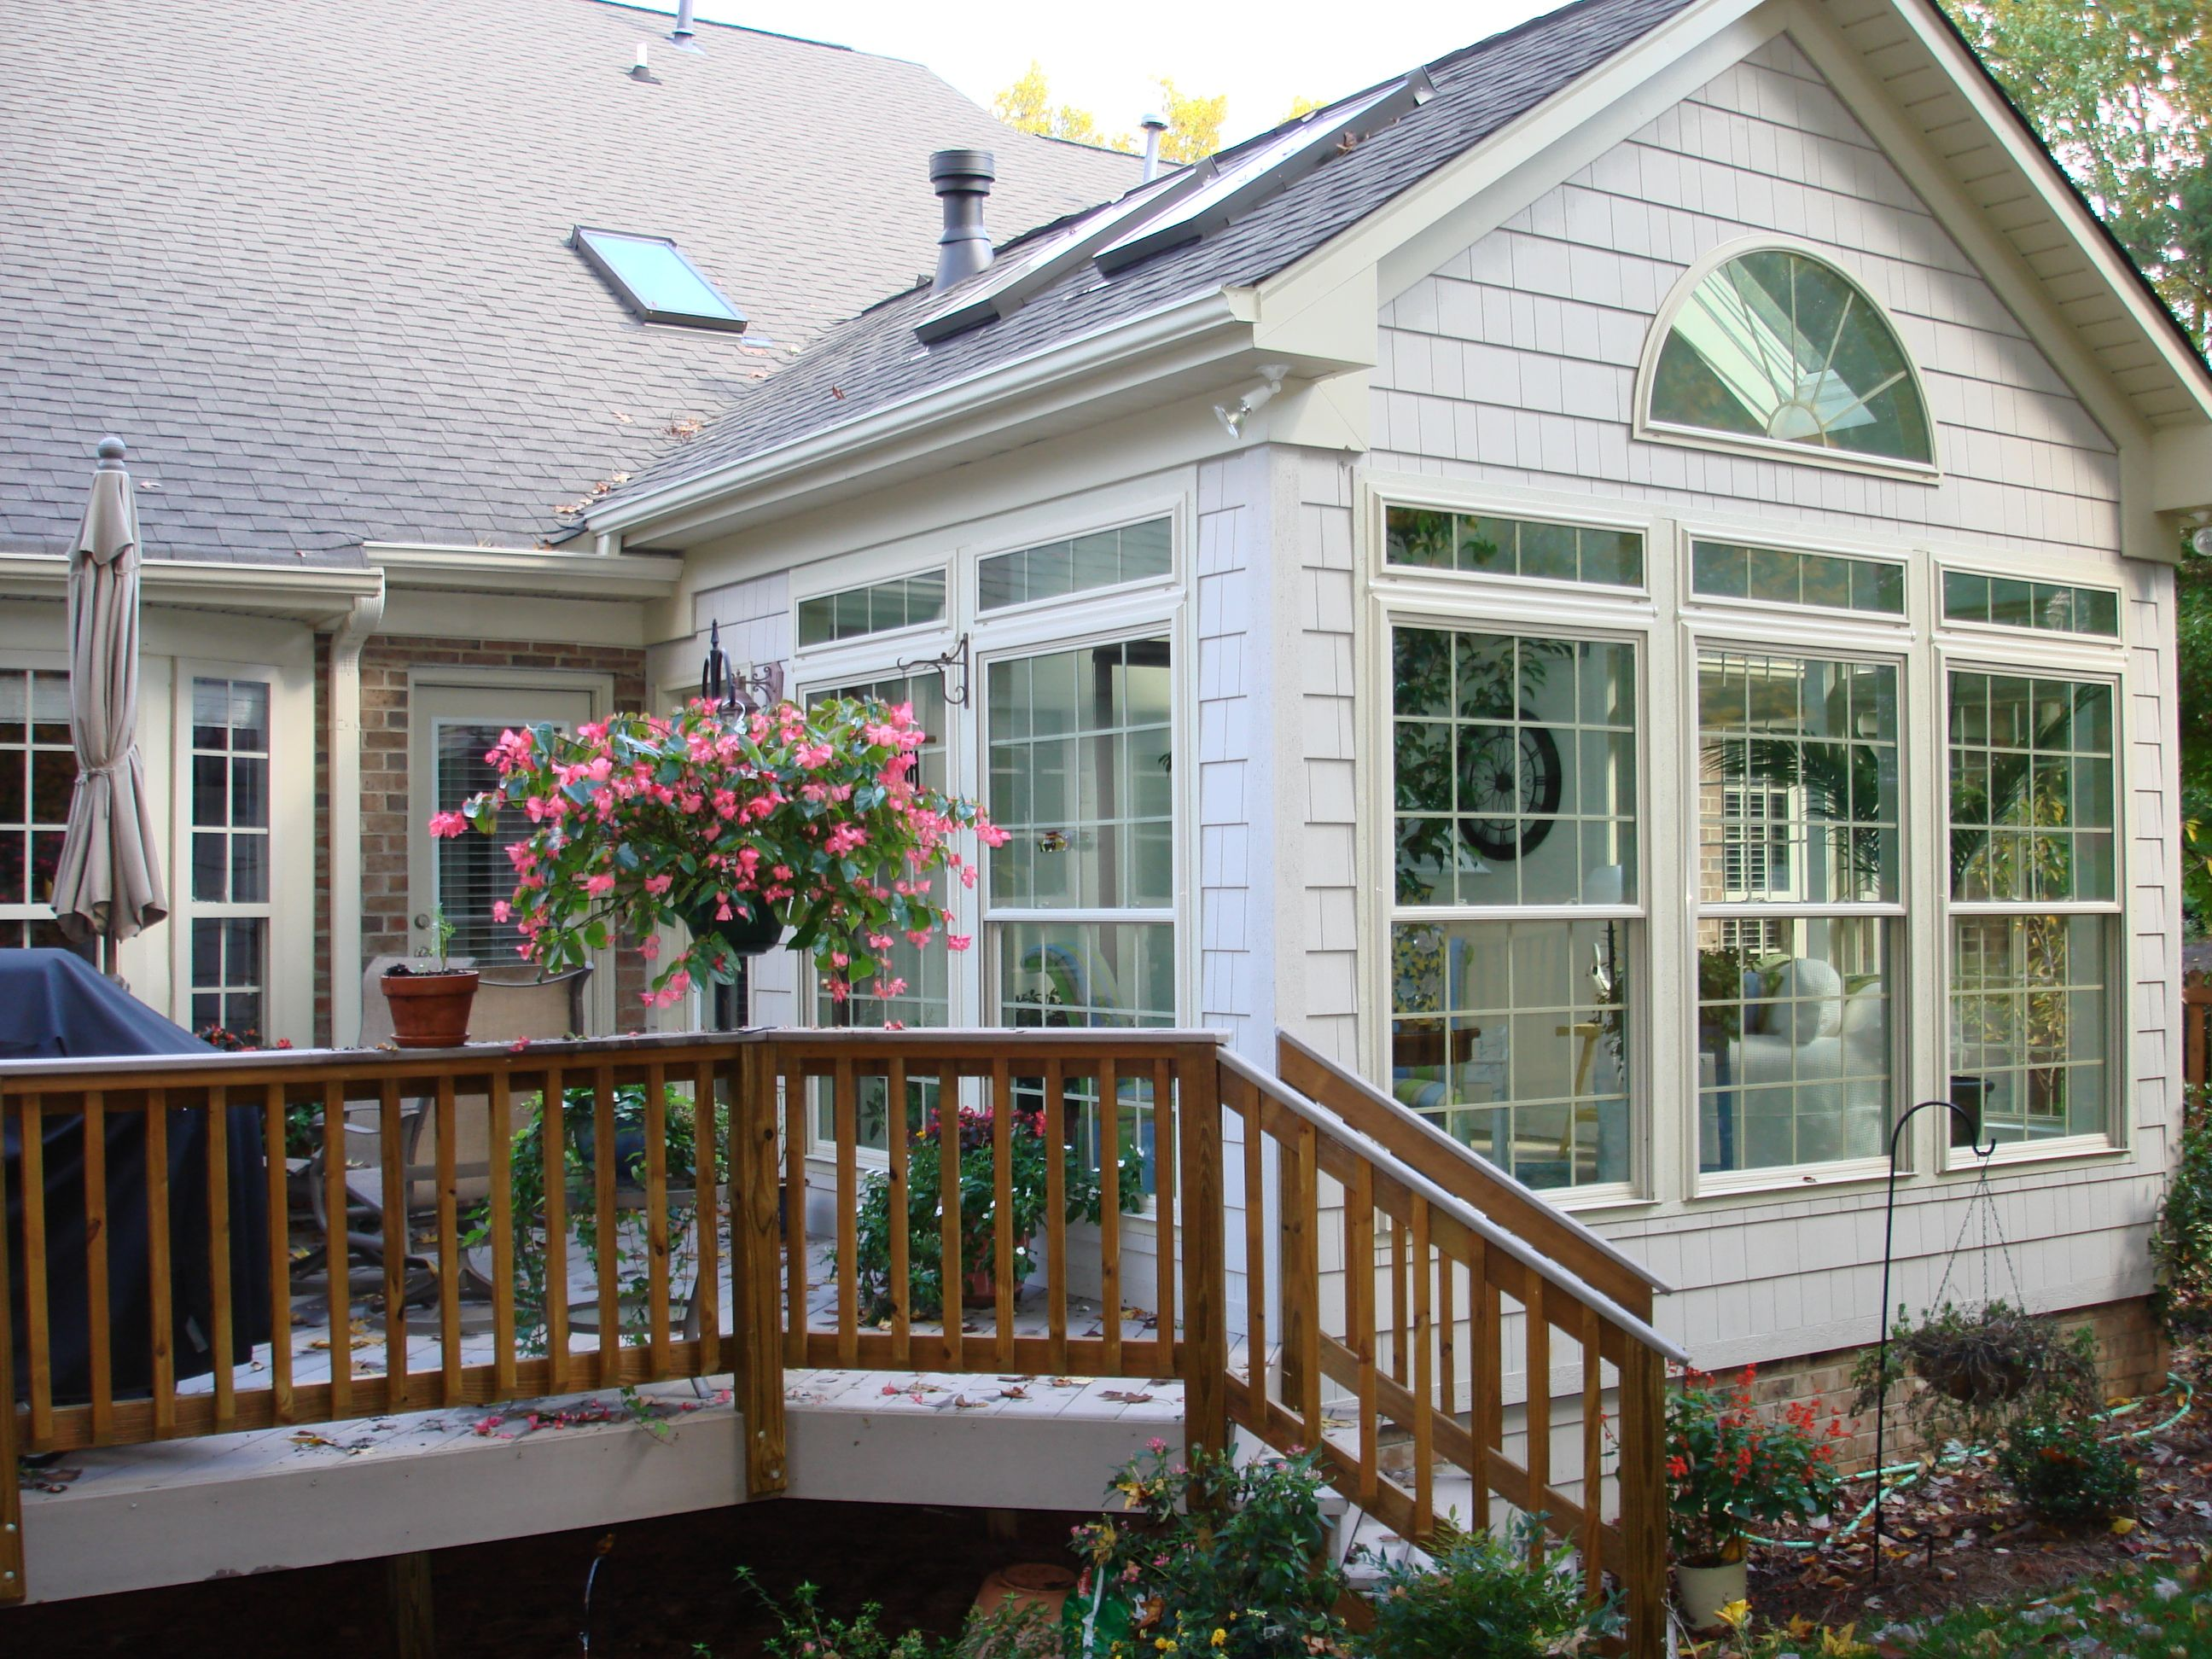 3 Season Room Ideas With Beautiful Pictures / Three Season Porches On A  Budget Ideas.patio Enclosure U0026 Roofline Decor For Sunroom. Idea